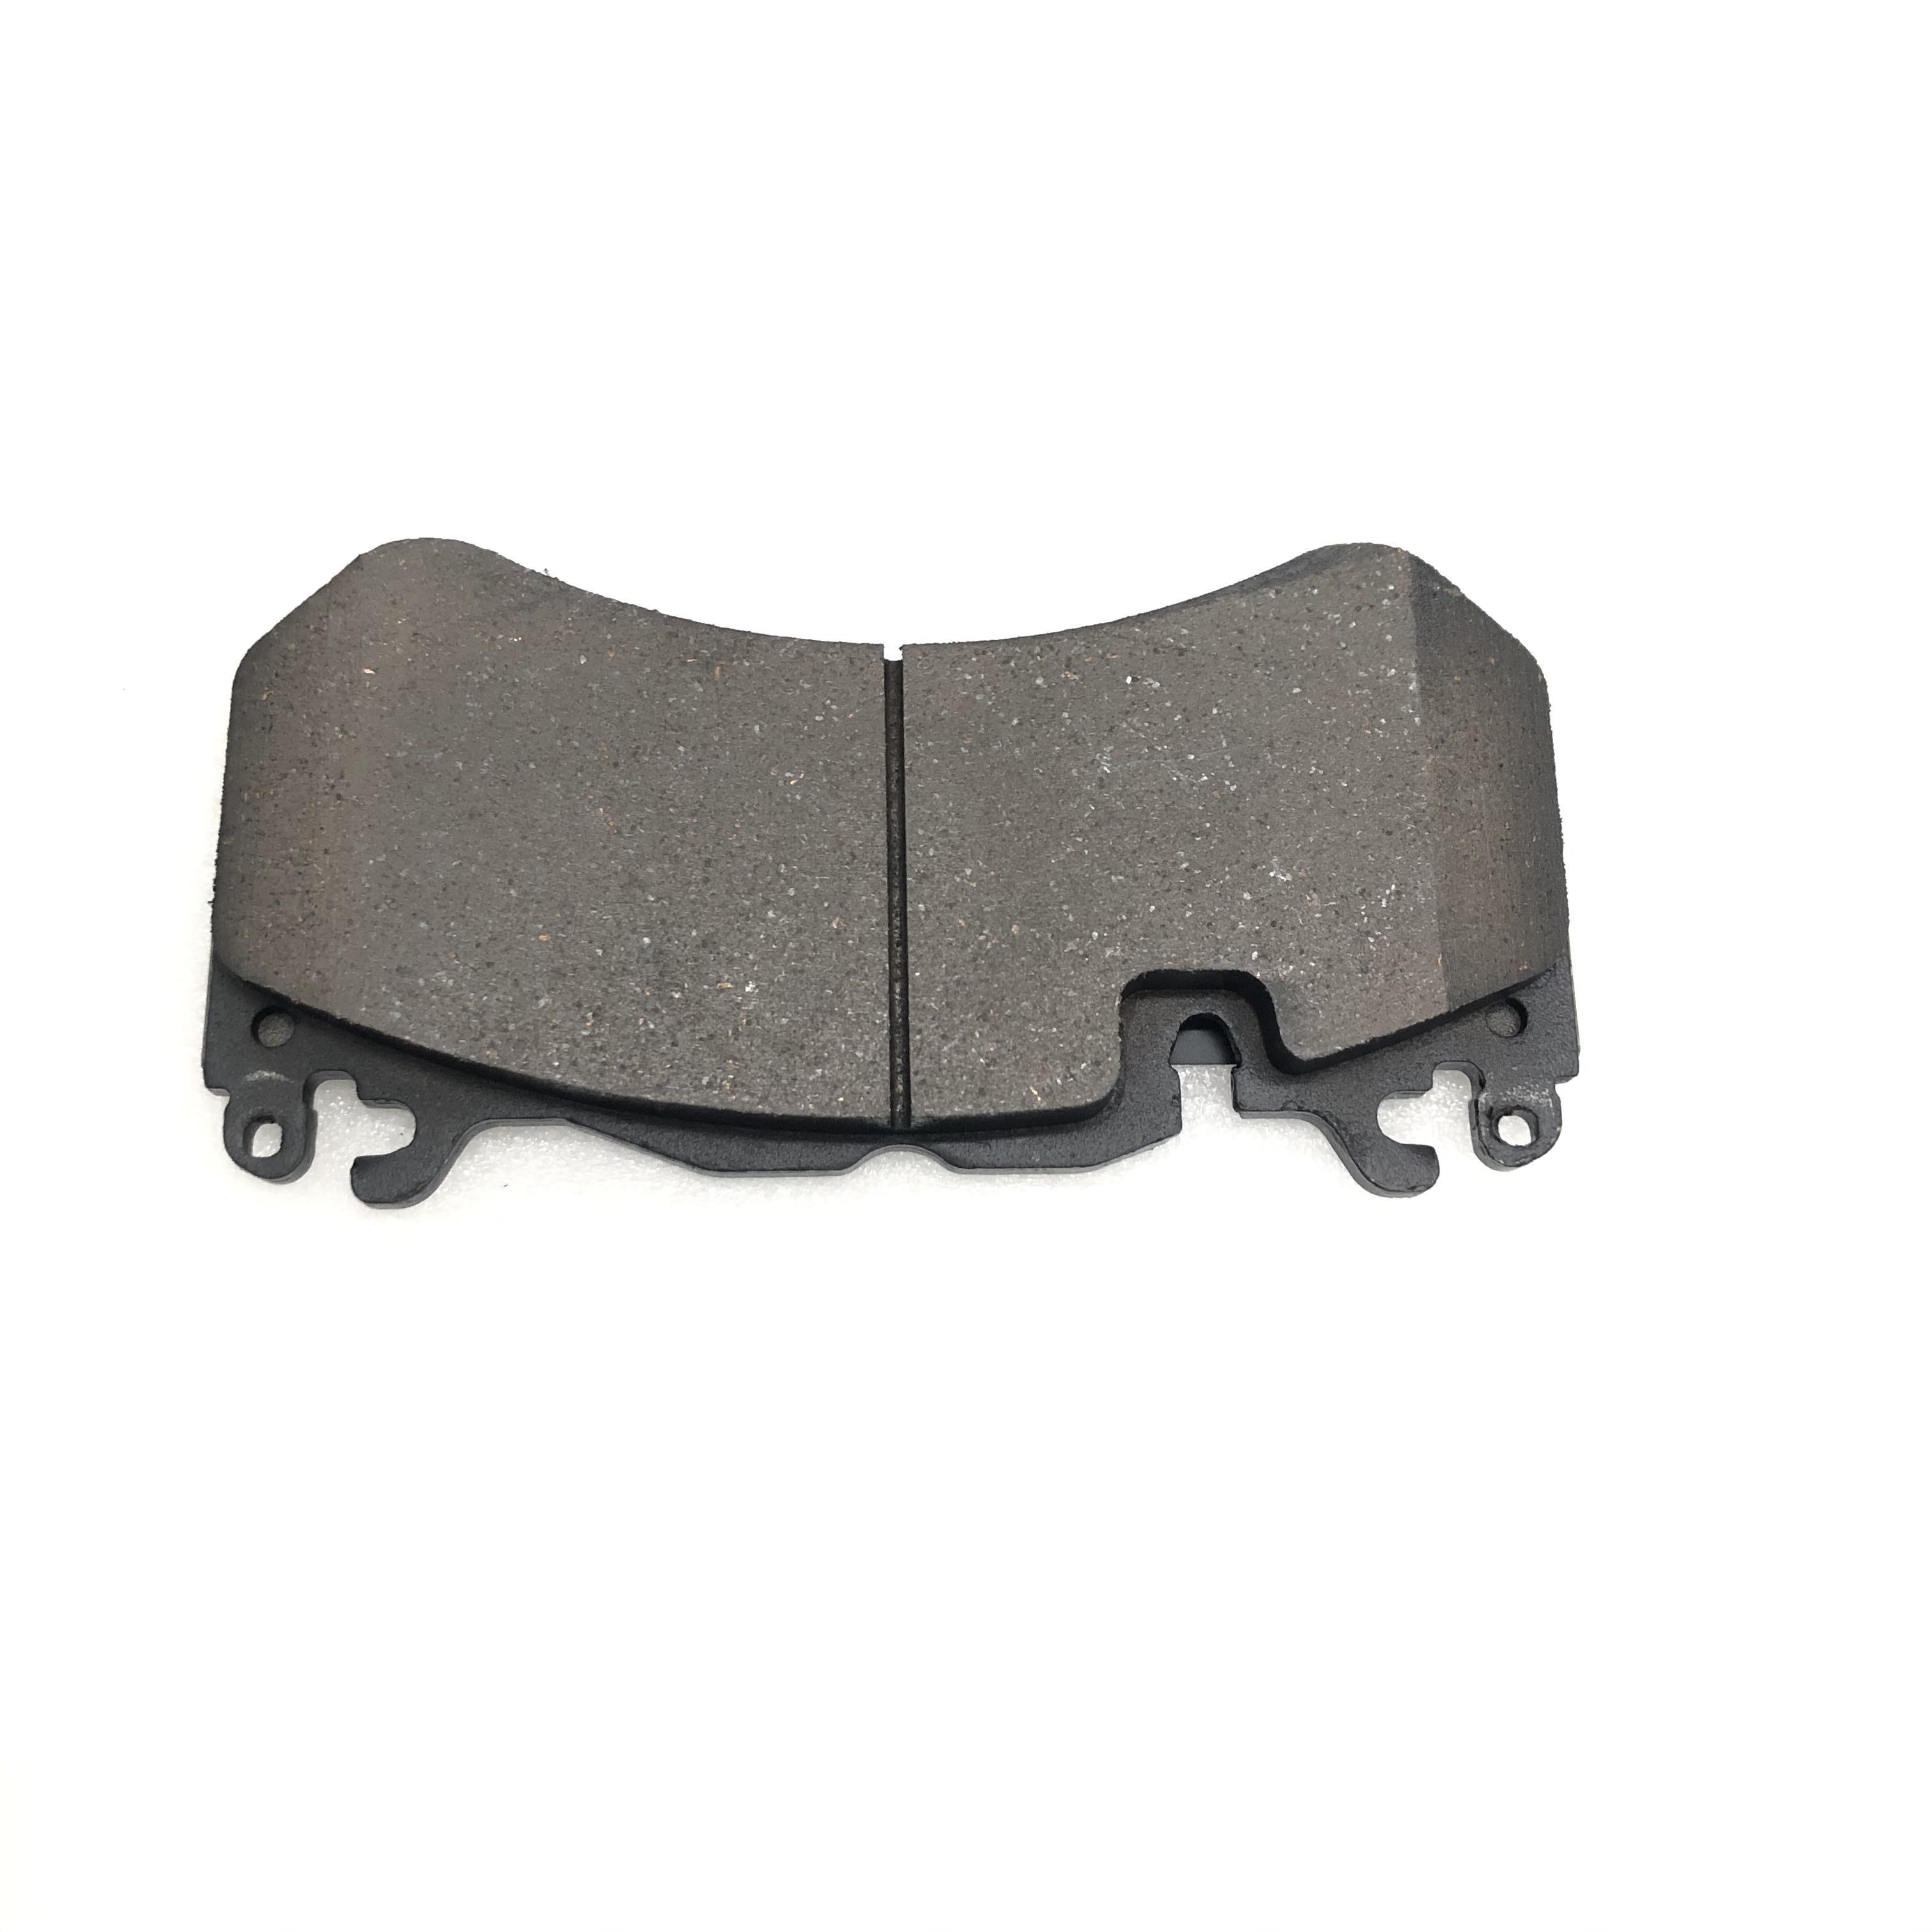 Jekit High performance AMG6 Brake pads for AMG6 Brake Caliper Brake Disc 380*36mm drilled disc area 72mm enlarge